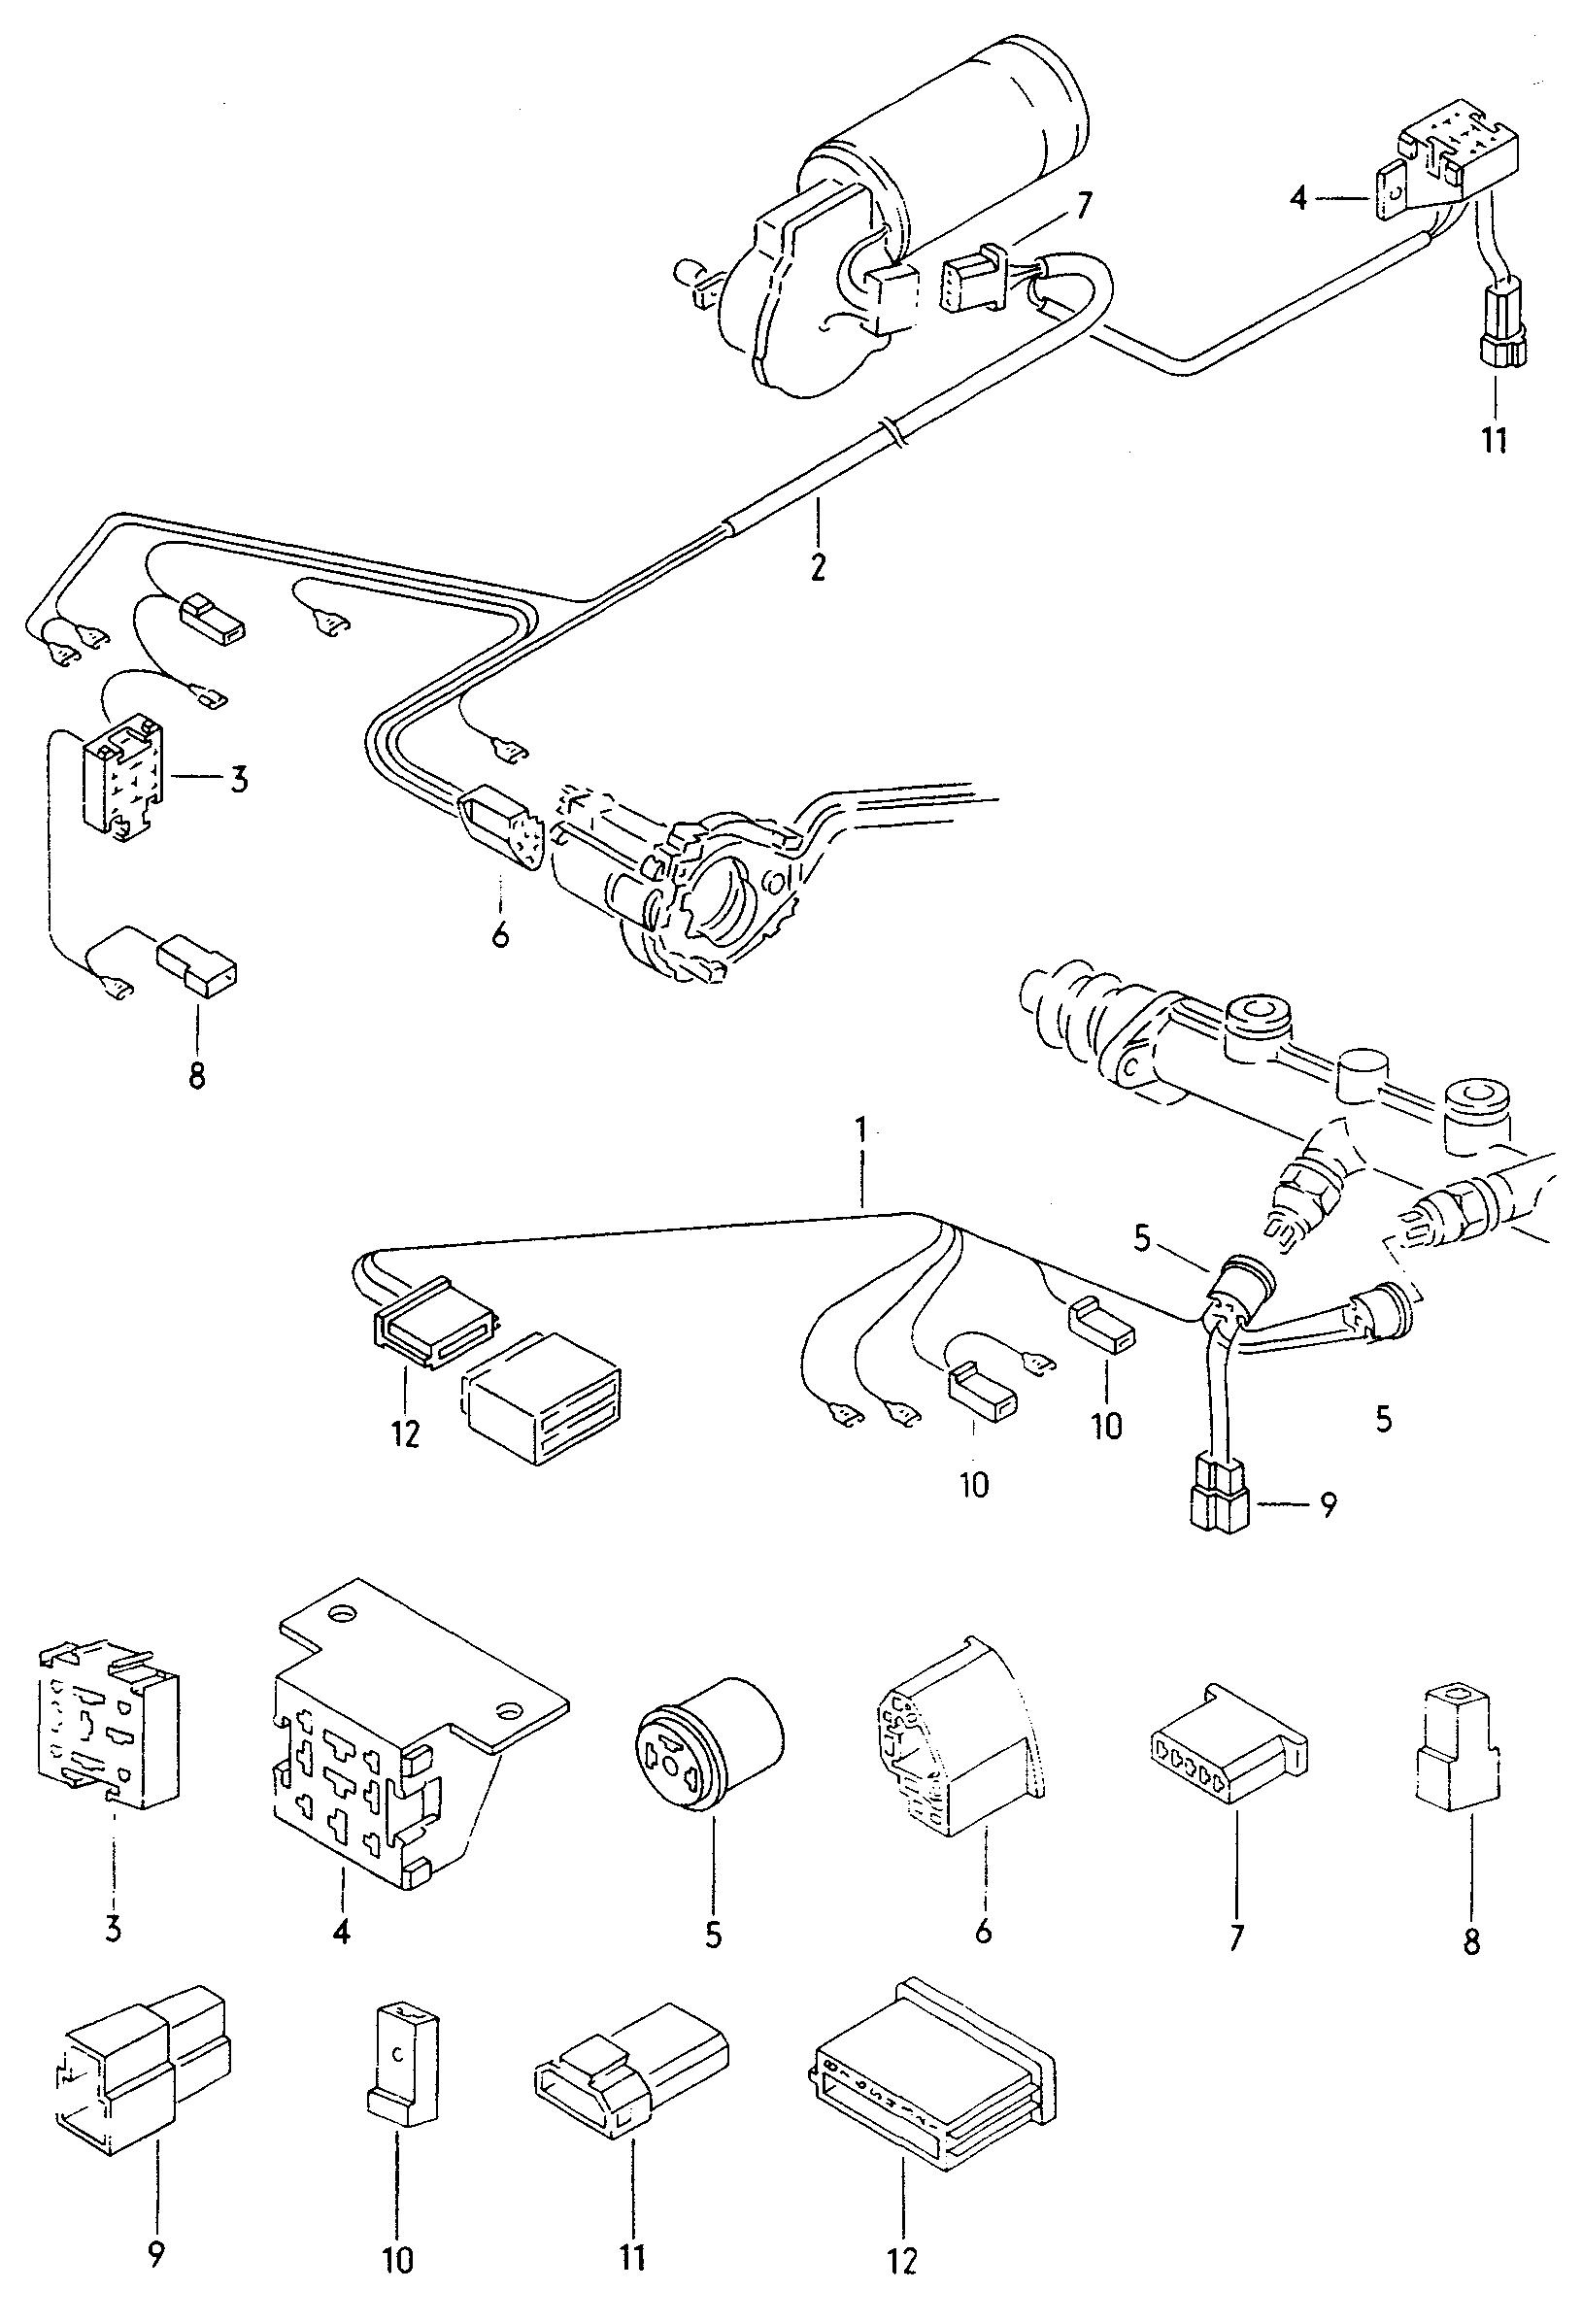 hight resolution of volkswagen vanagon 1980 1985 vag etka